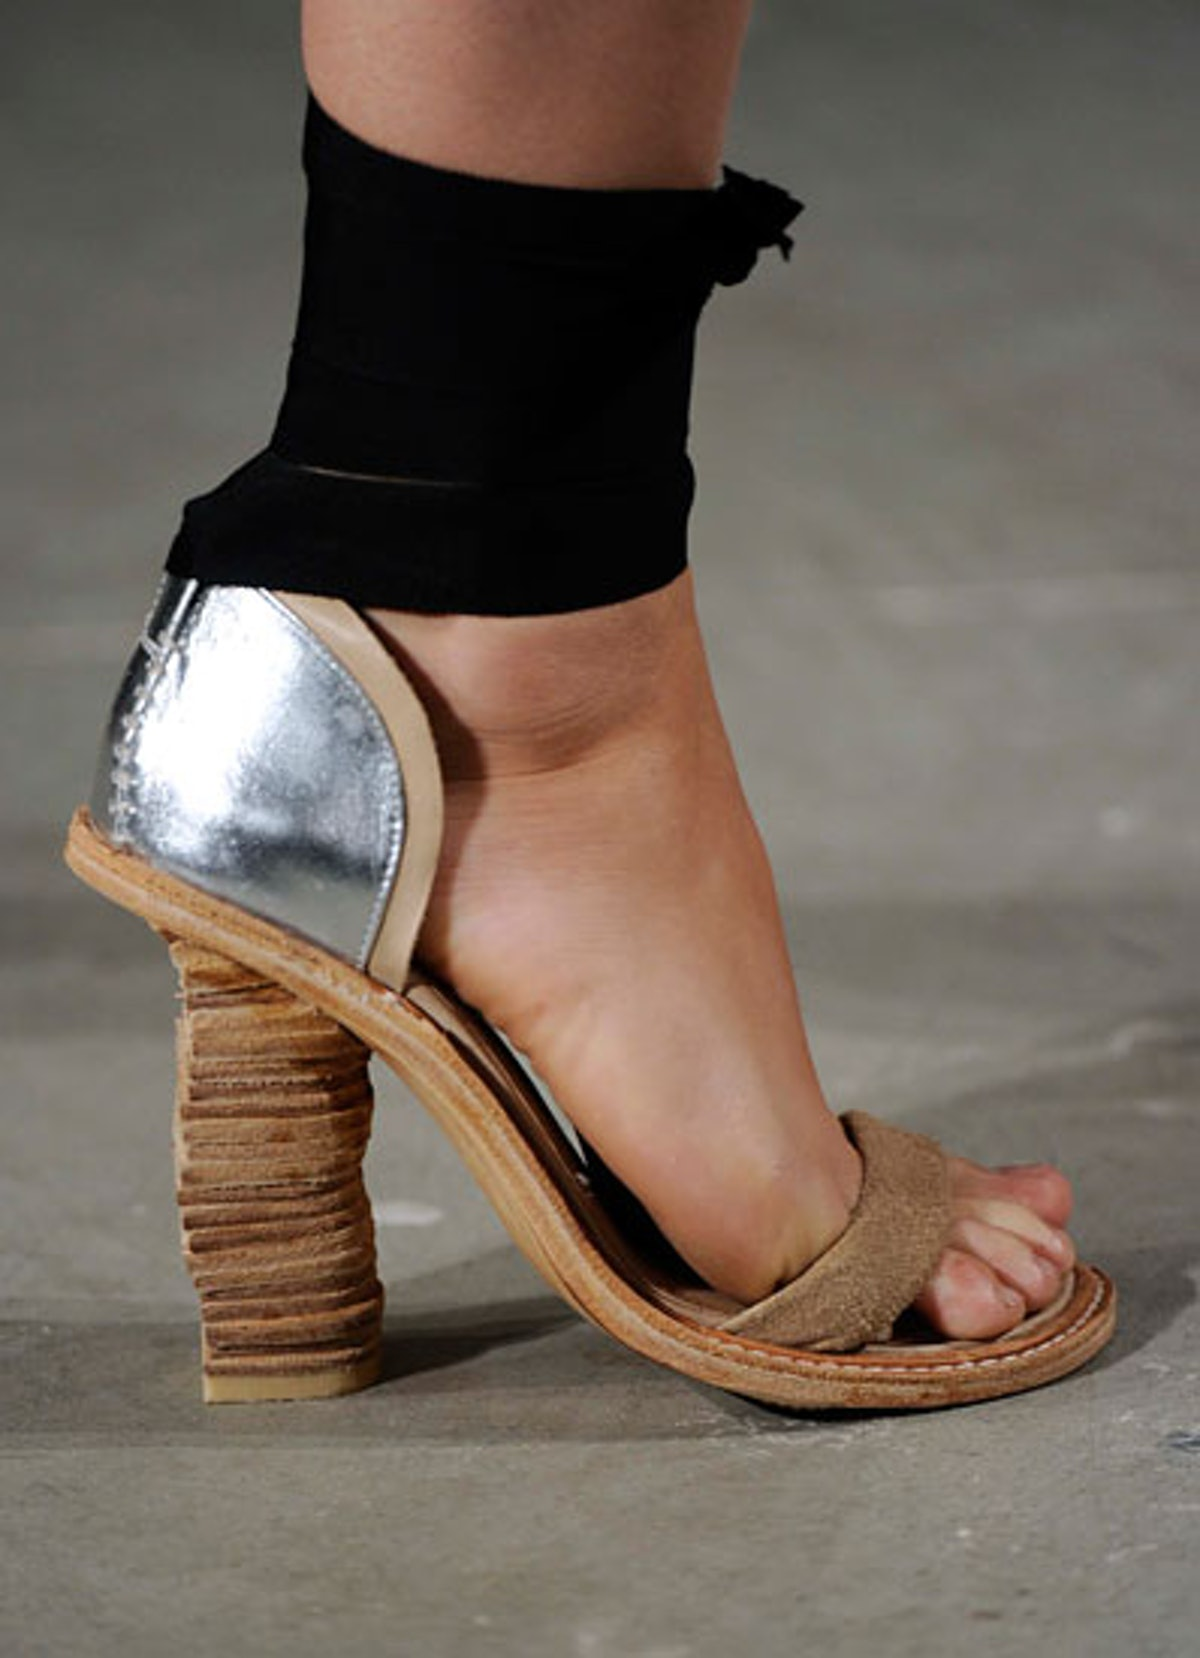 acss_shoes_05_v.jpg